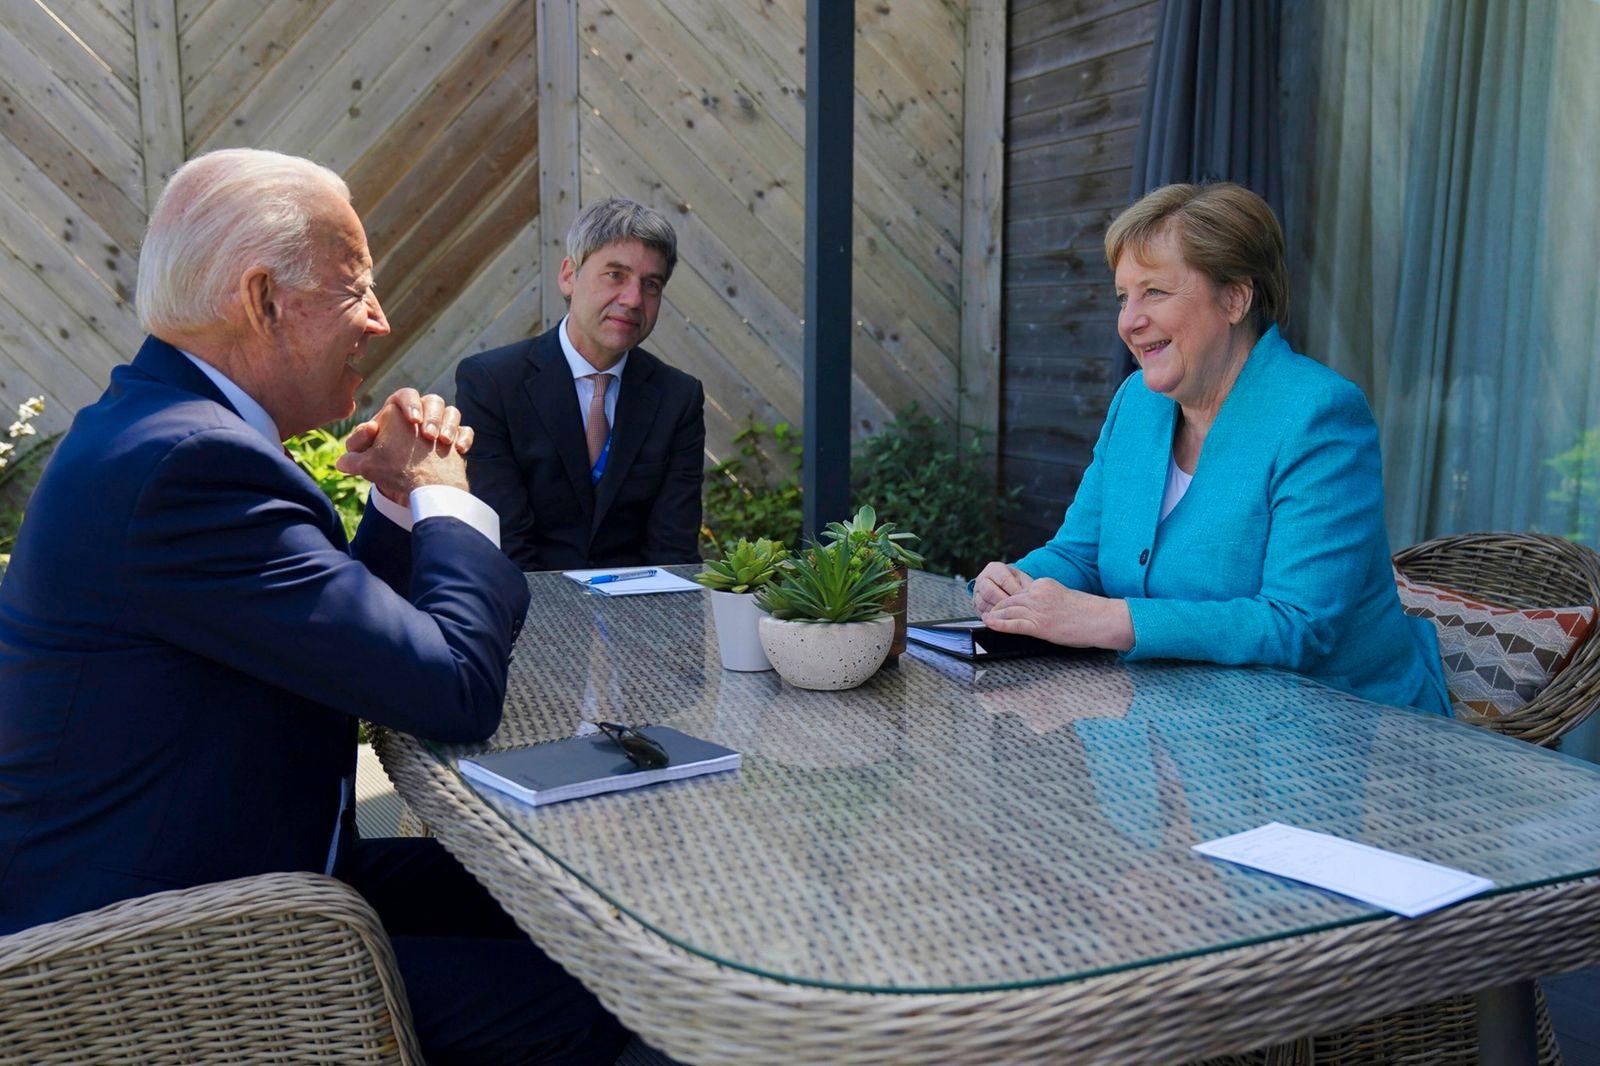 STYLELOCATIONU.S President Joe Biden during a bilateral meeting with German Chancellor Angela Merkel, right, and Jan He